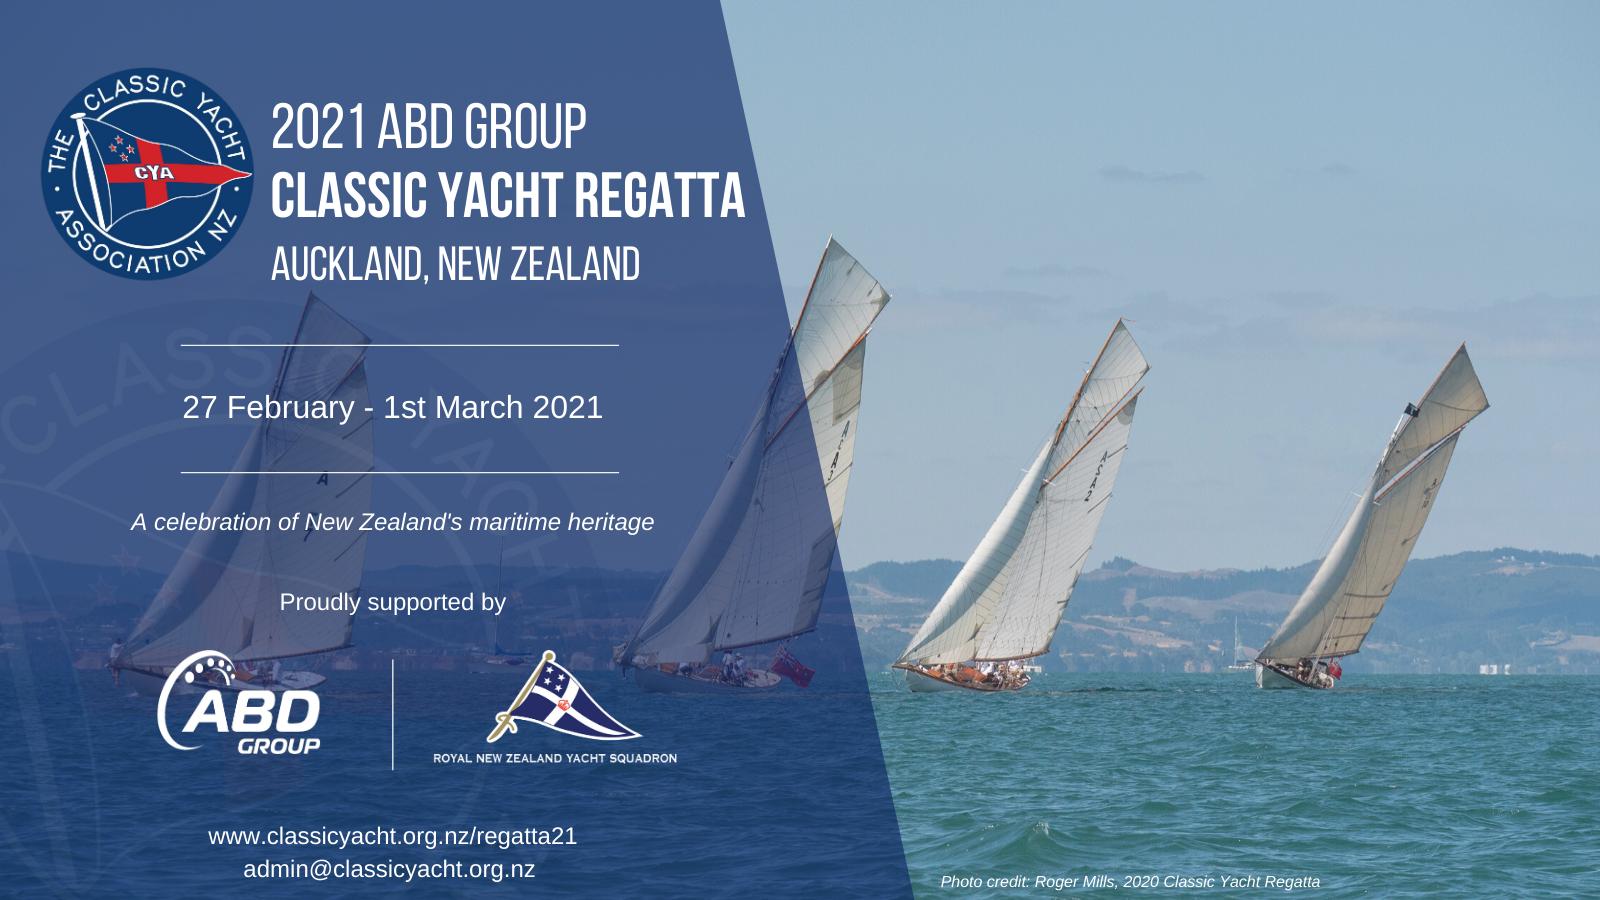 2021 ABD Group Classic Yacht Regatta Auckland